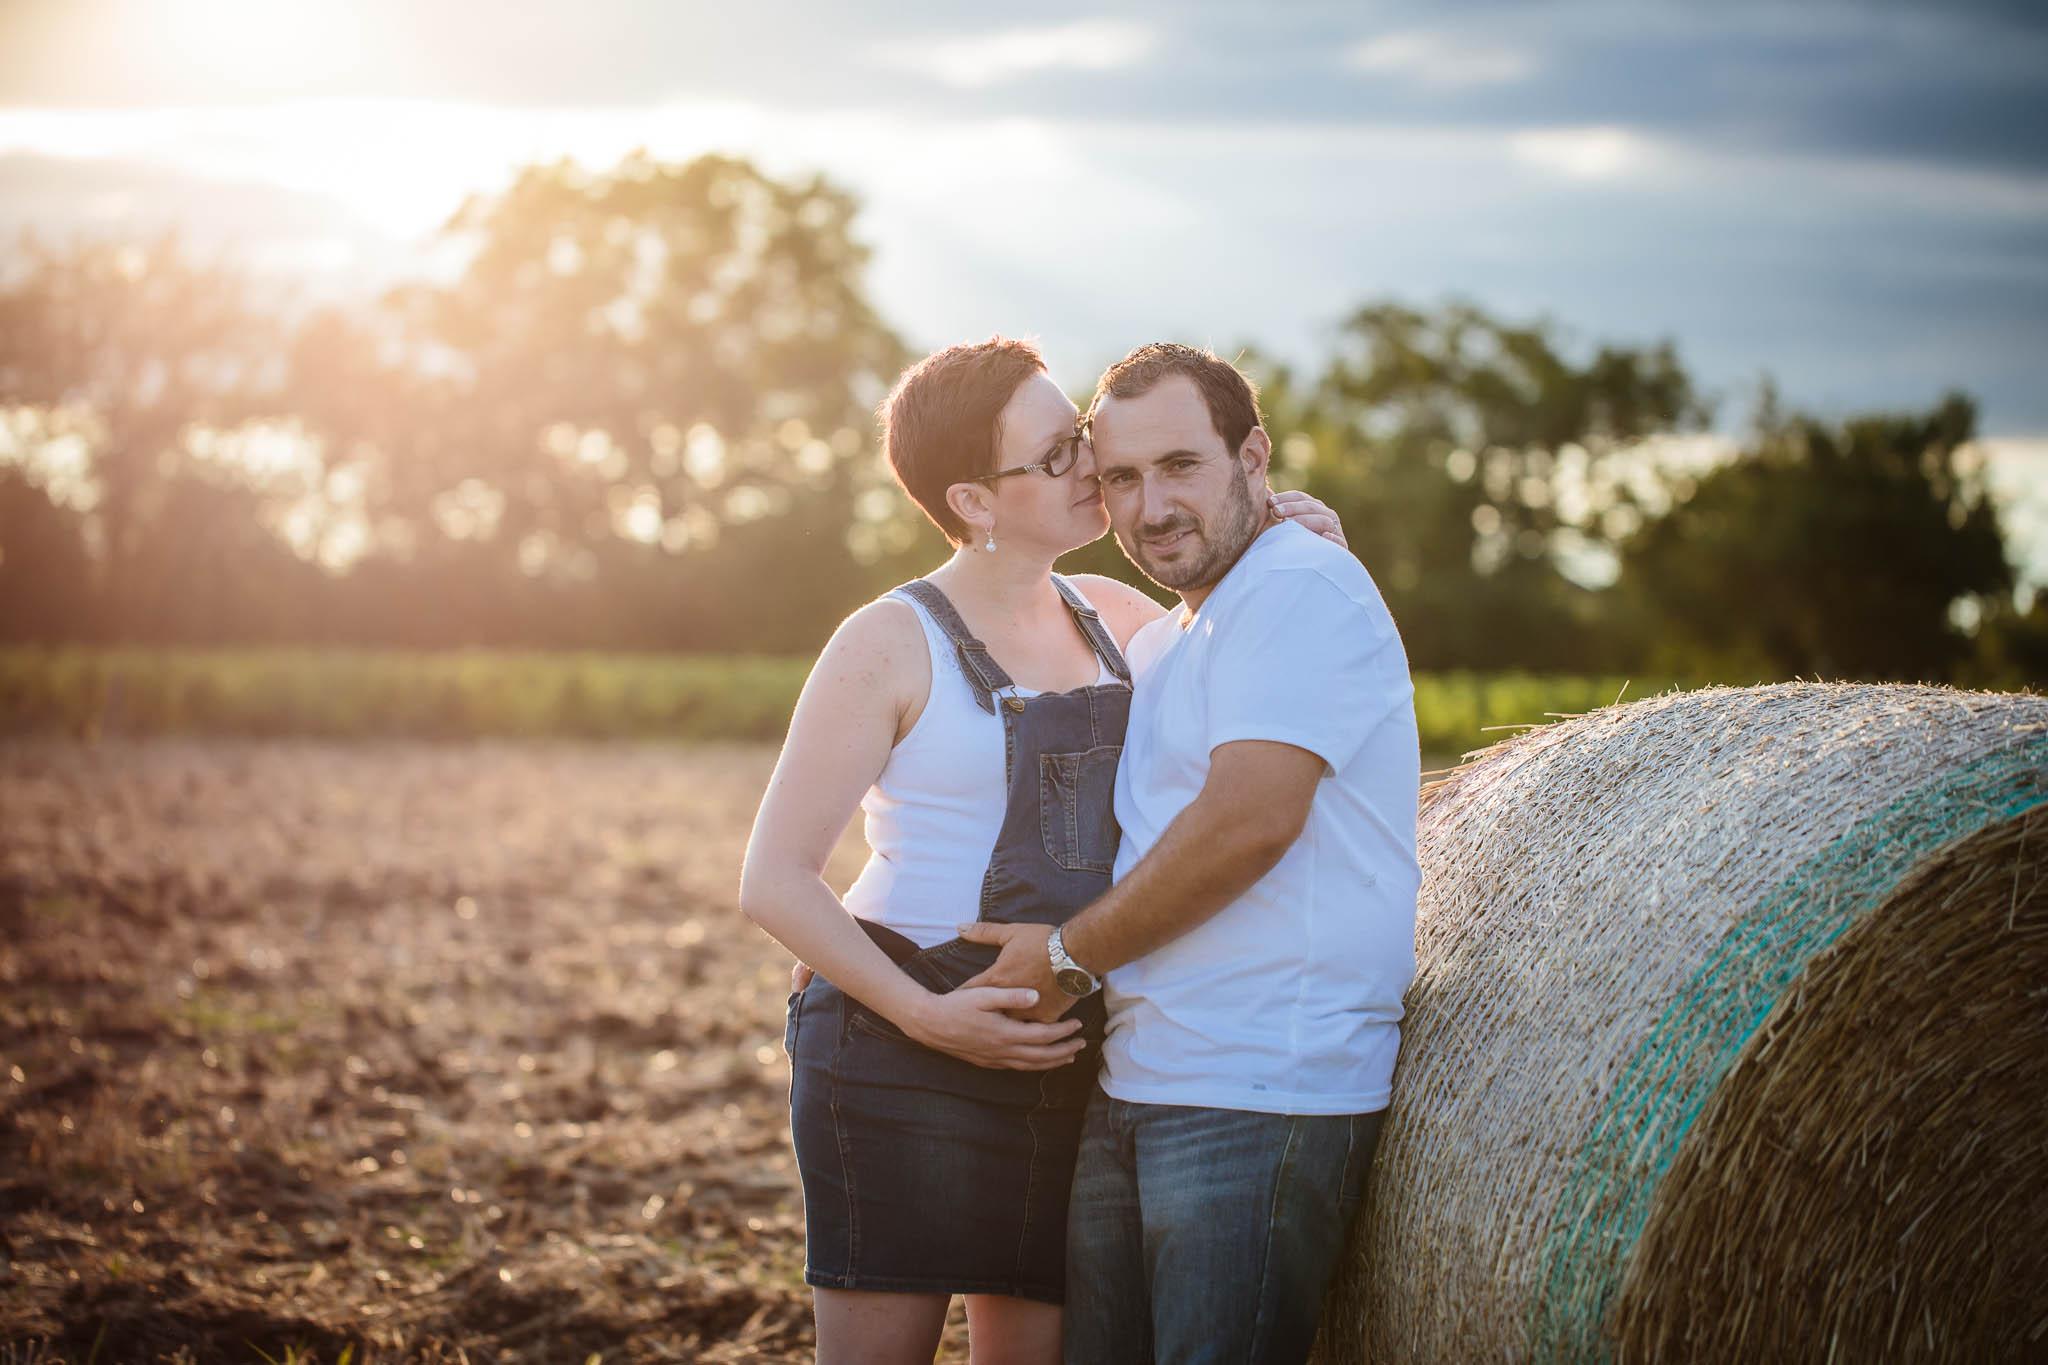 grossesse-femme-enceinte-couple-nature-campagne-ingold-photographe-94.jpg